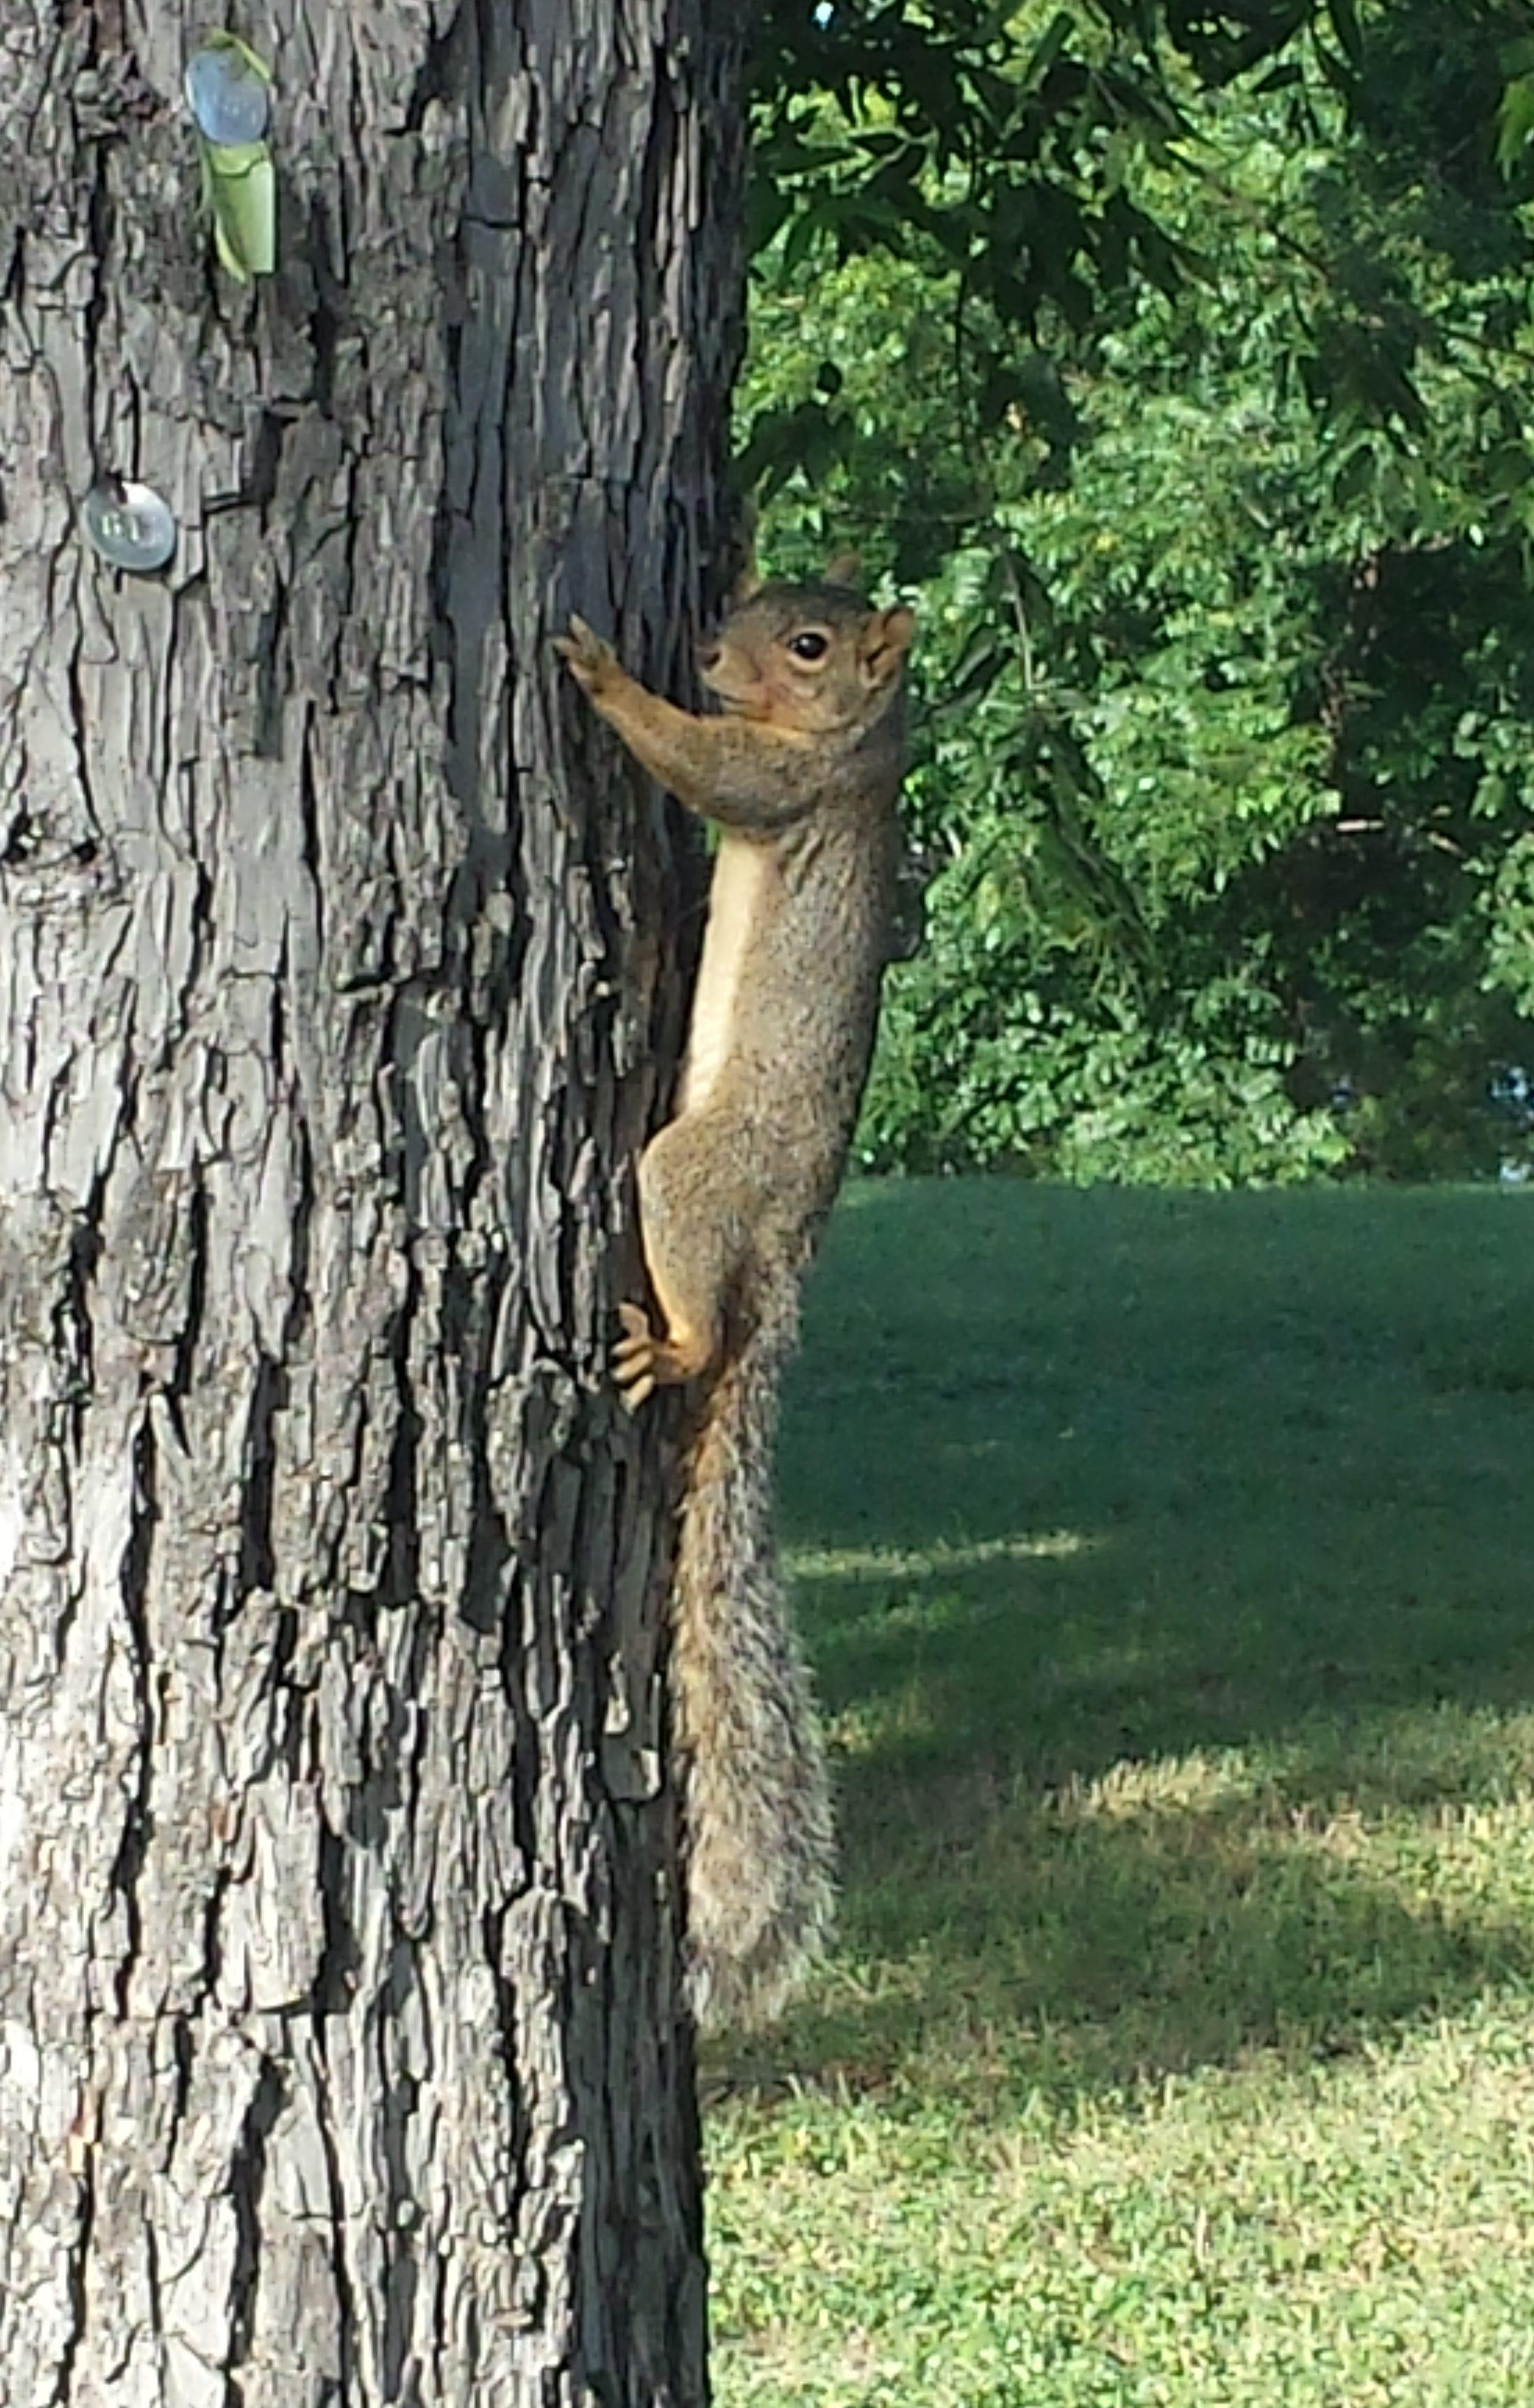 Eastern gray squirrel,Austin, Texas, 21 June 2016.